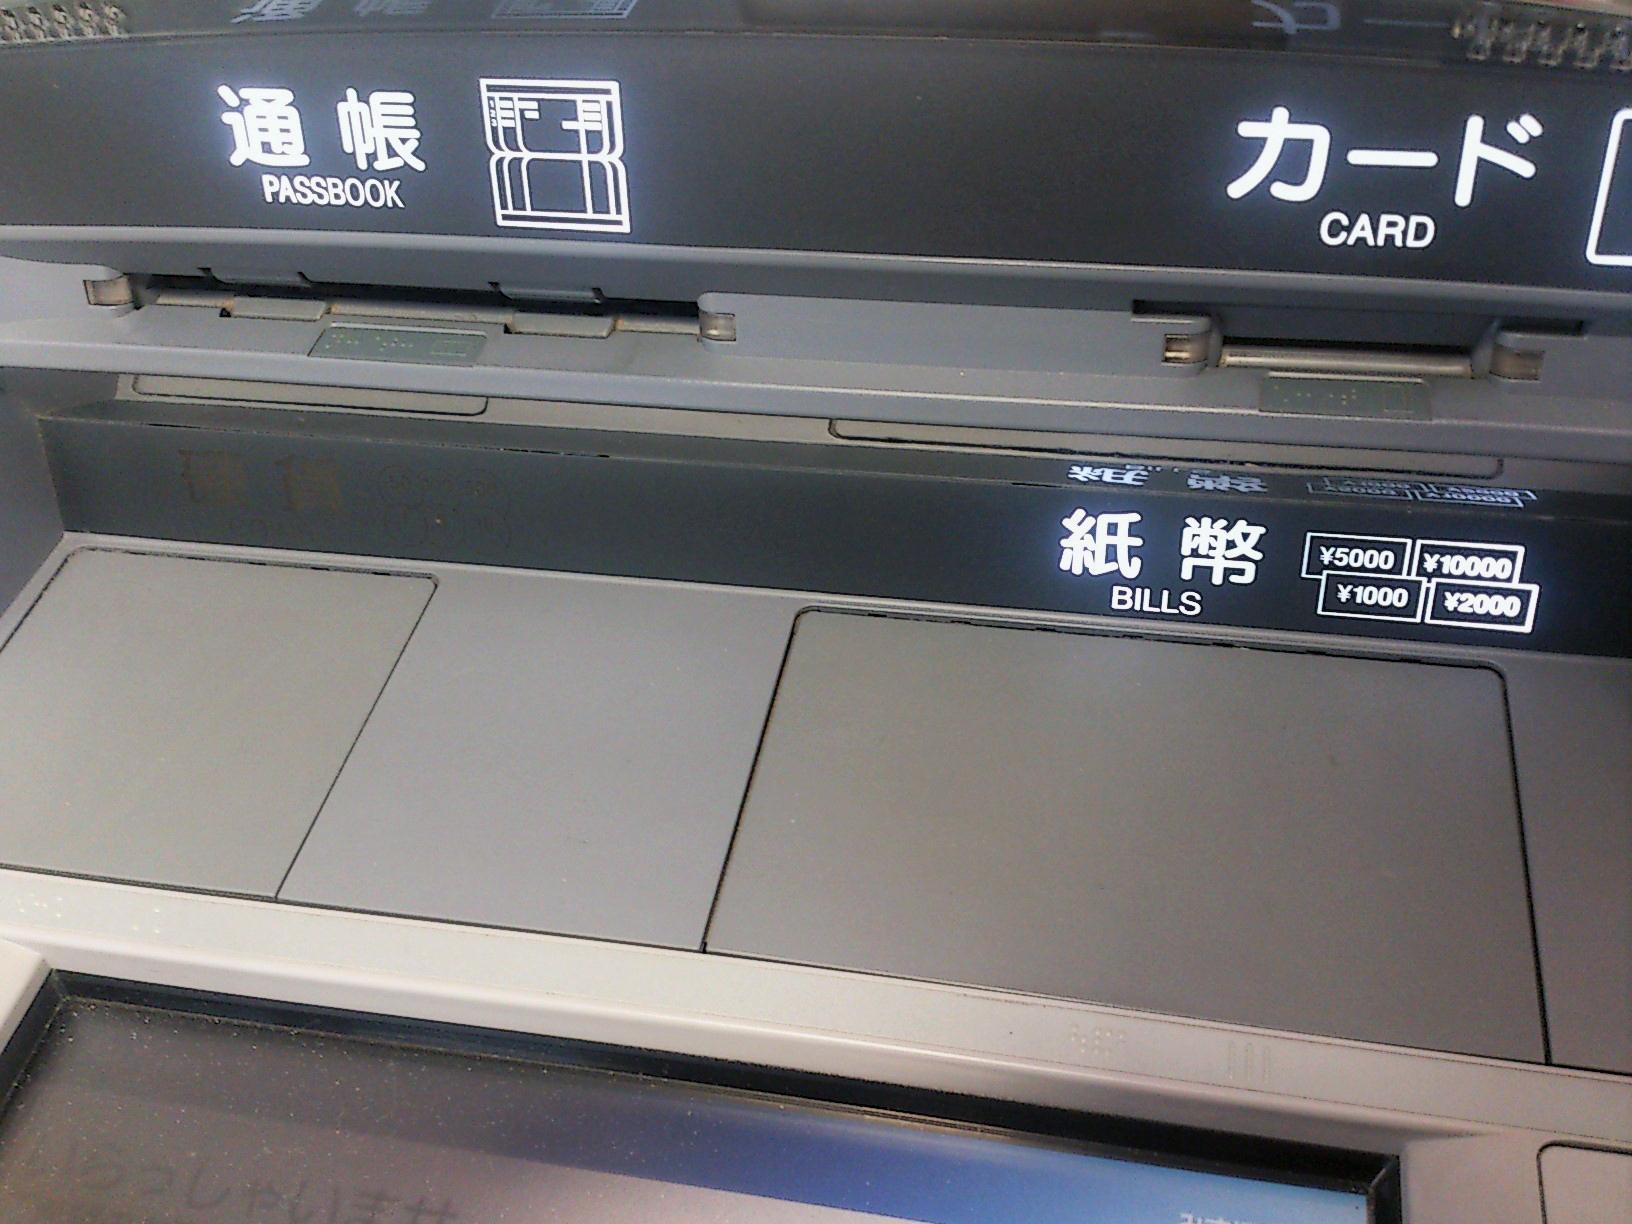 ATM の利用回数を減らして銀行に払う手数料を激減させる方法